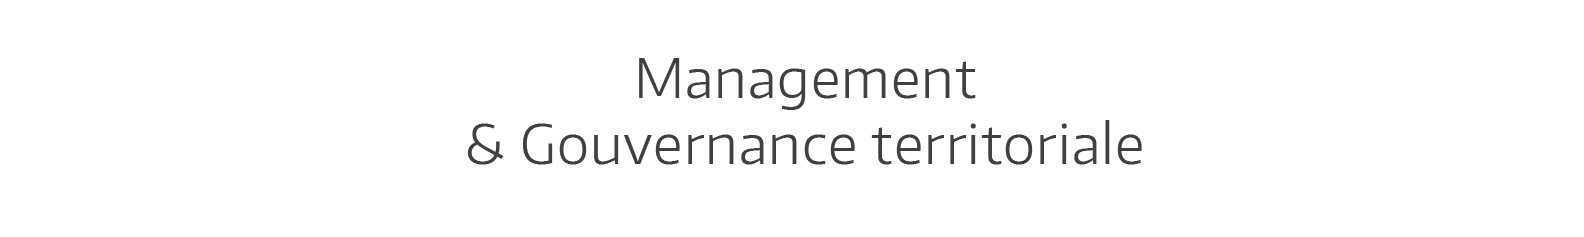 Olivier Terrien Management et Gouvernance Territoriale